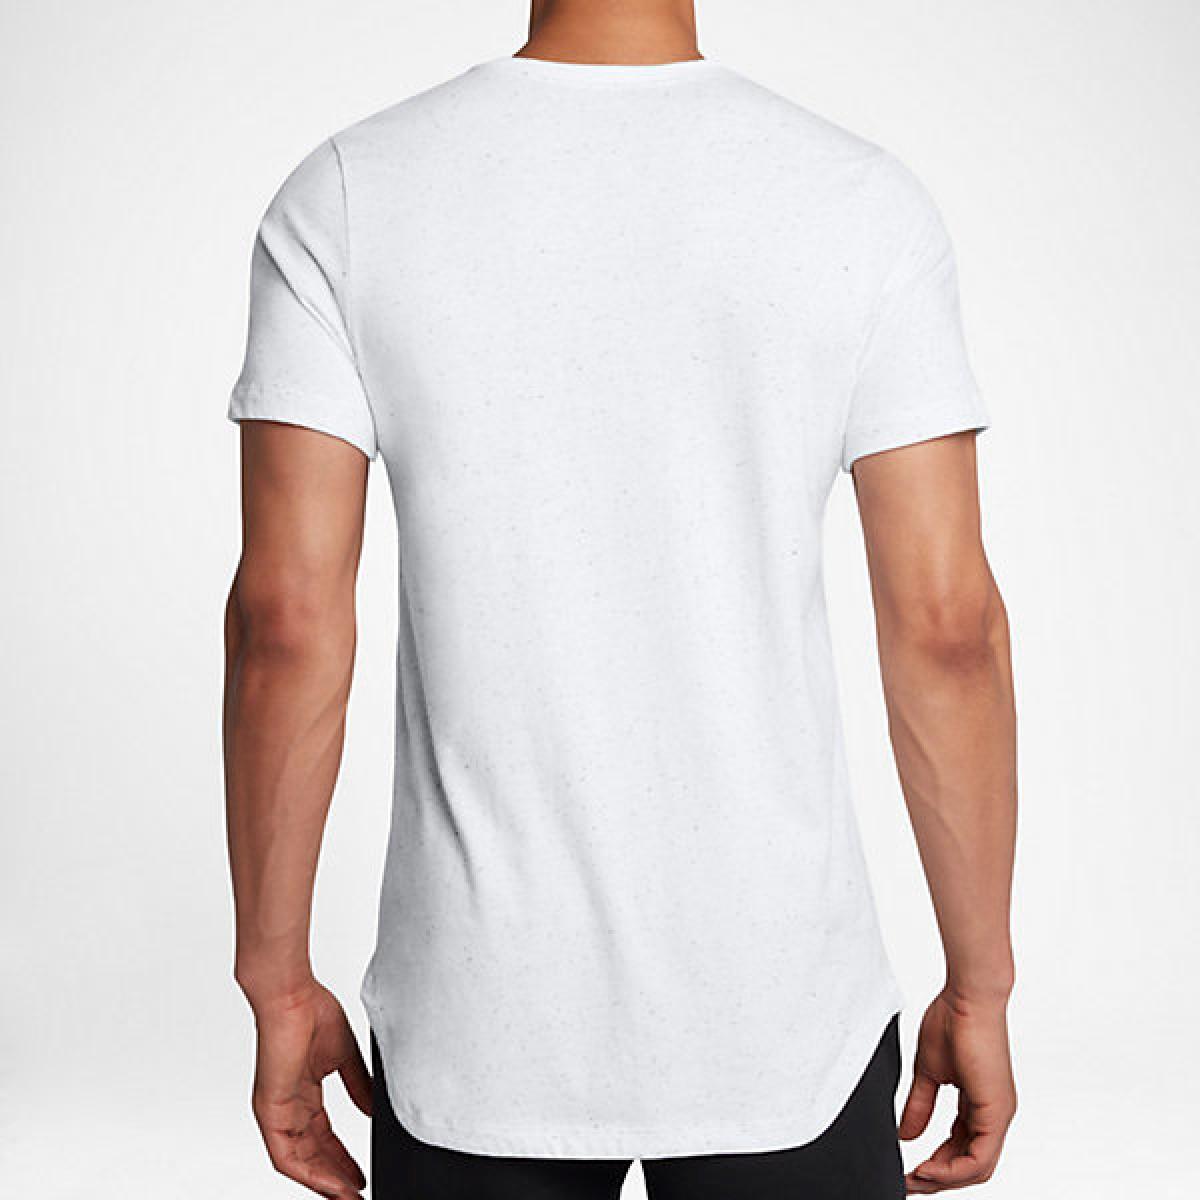 Jordan Sportswear Future 2 T-Shirt 'White' 862427-100